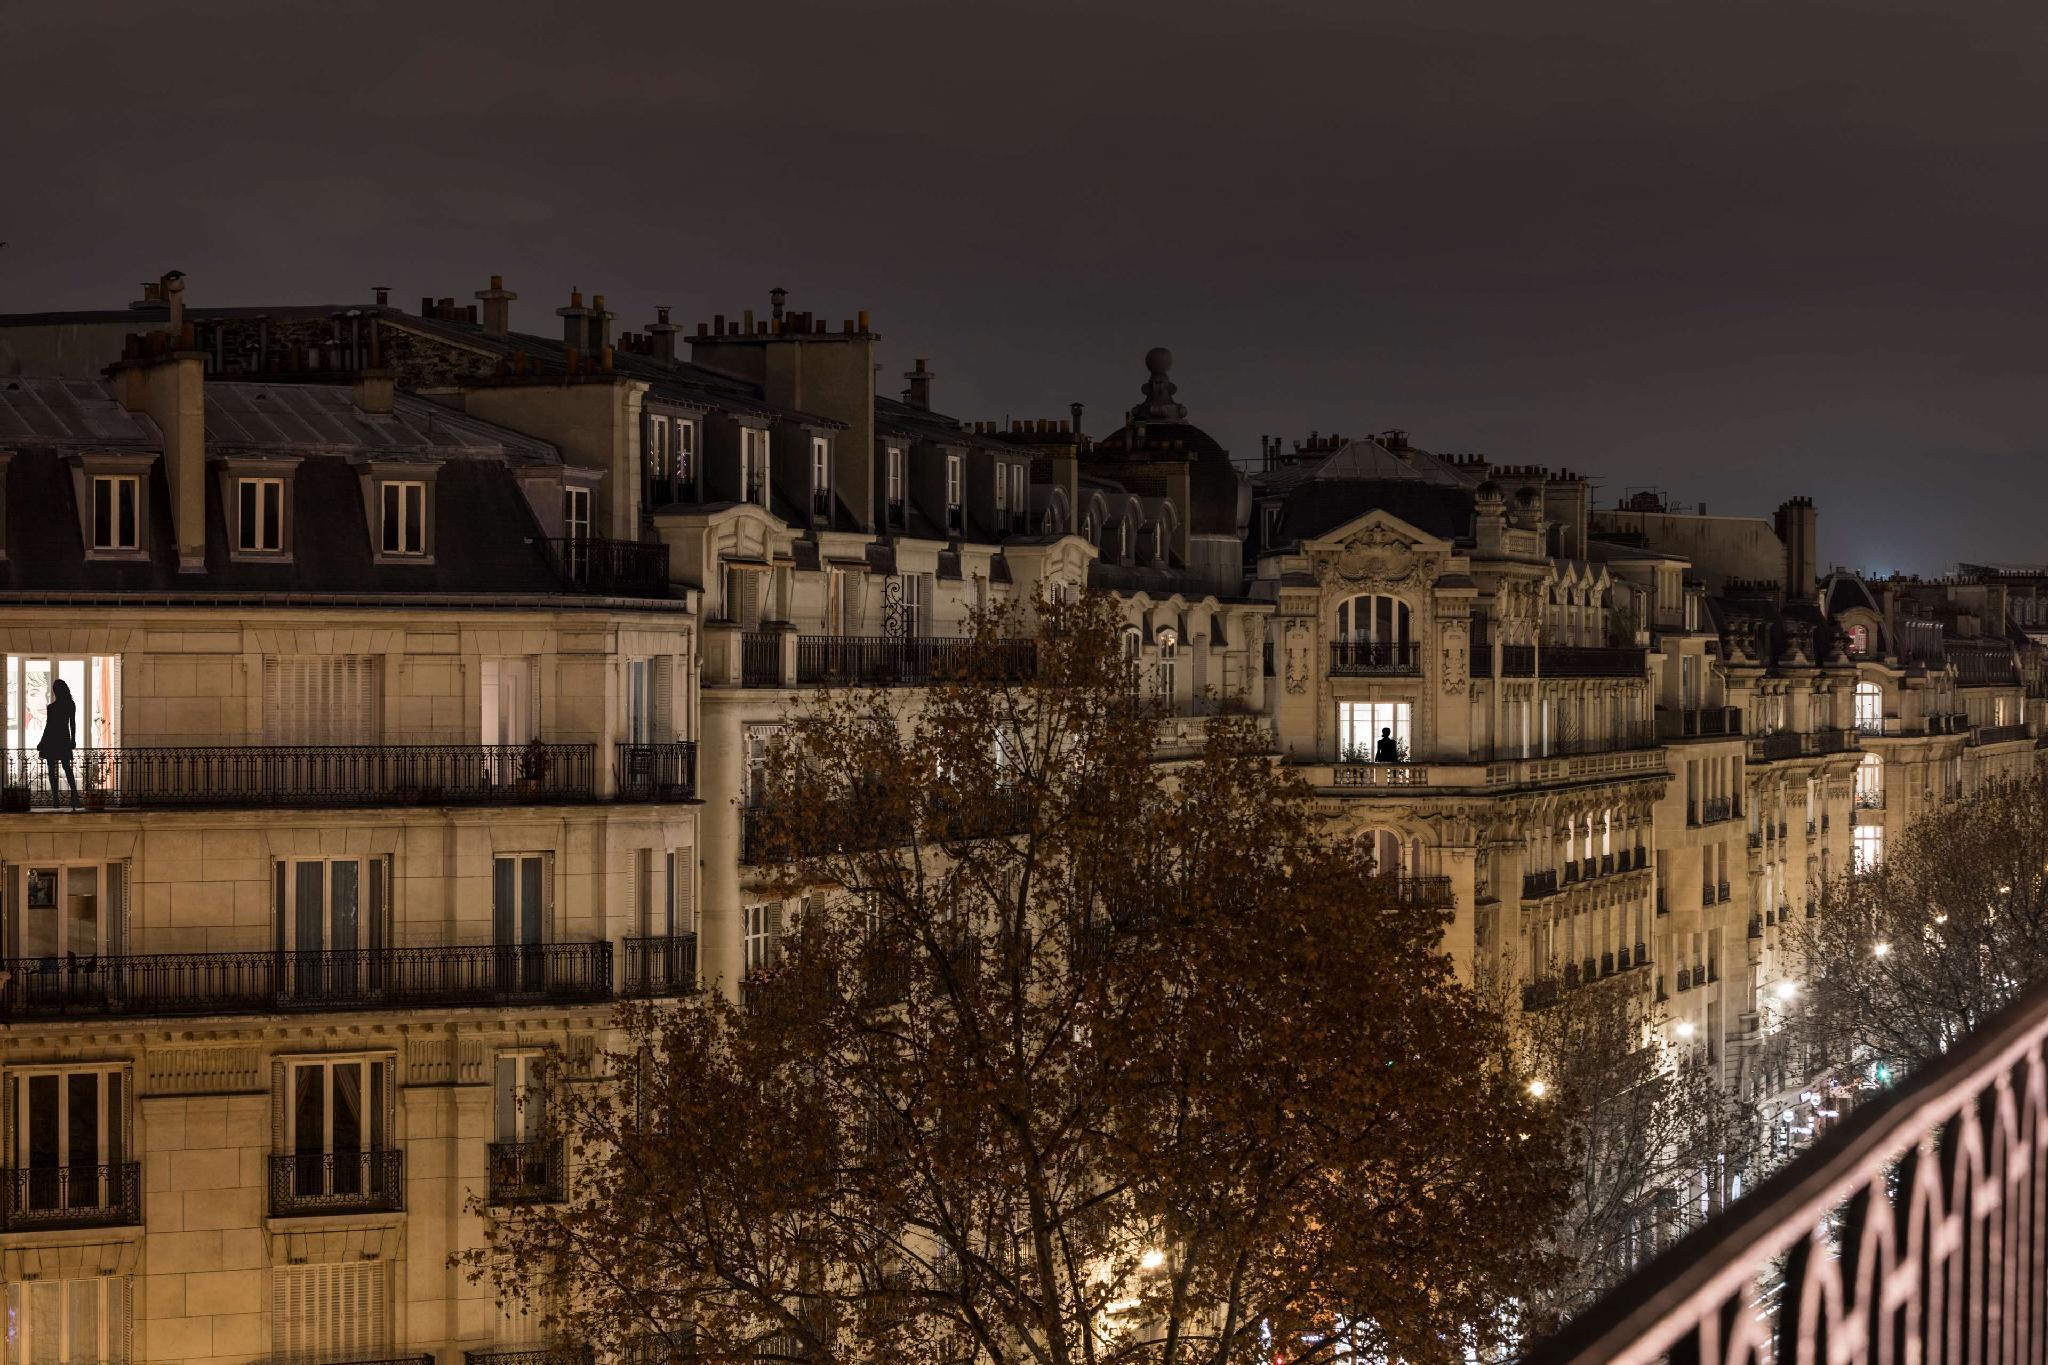 K+K Hotel Cayre Saint Germain des Pres